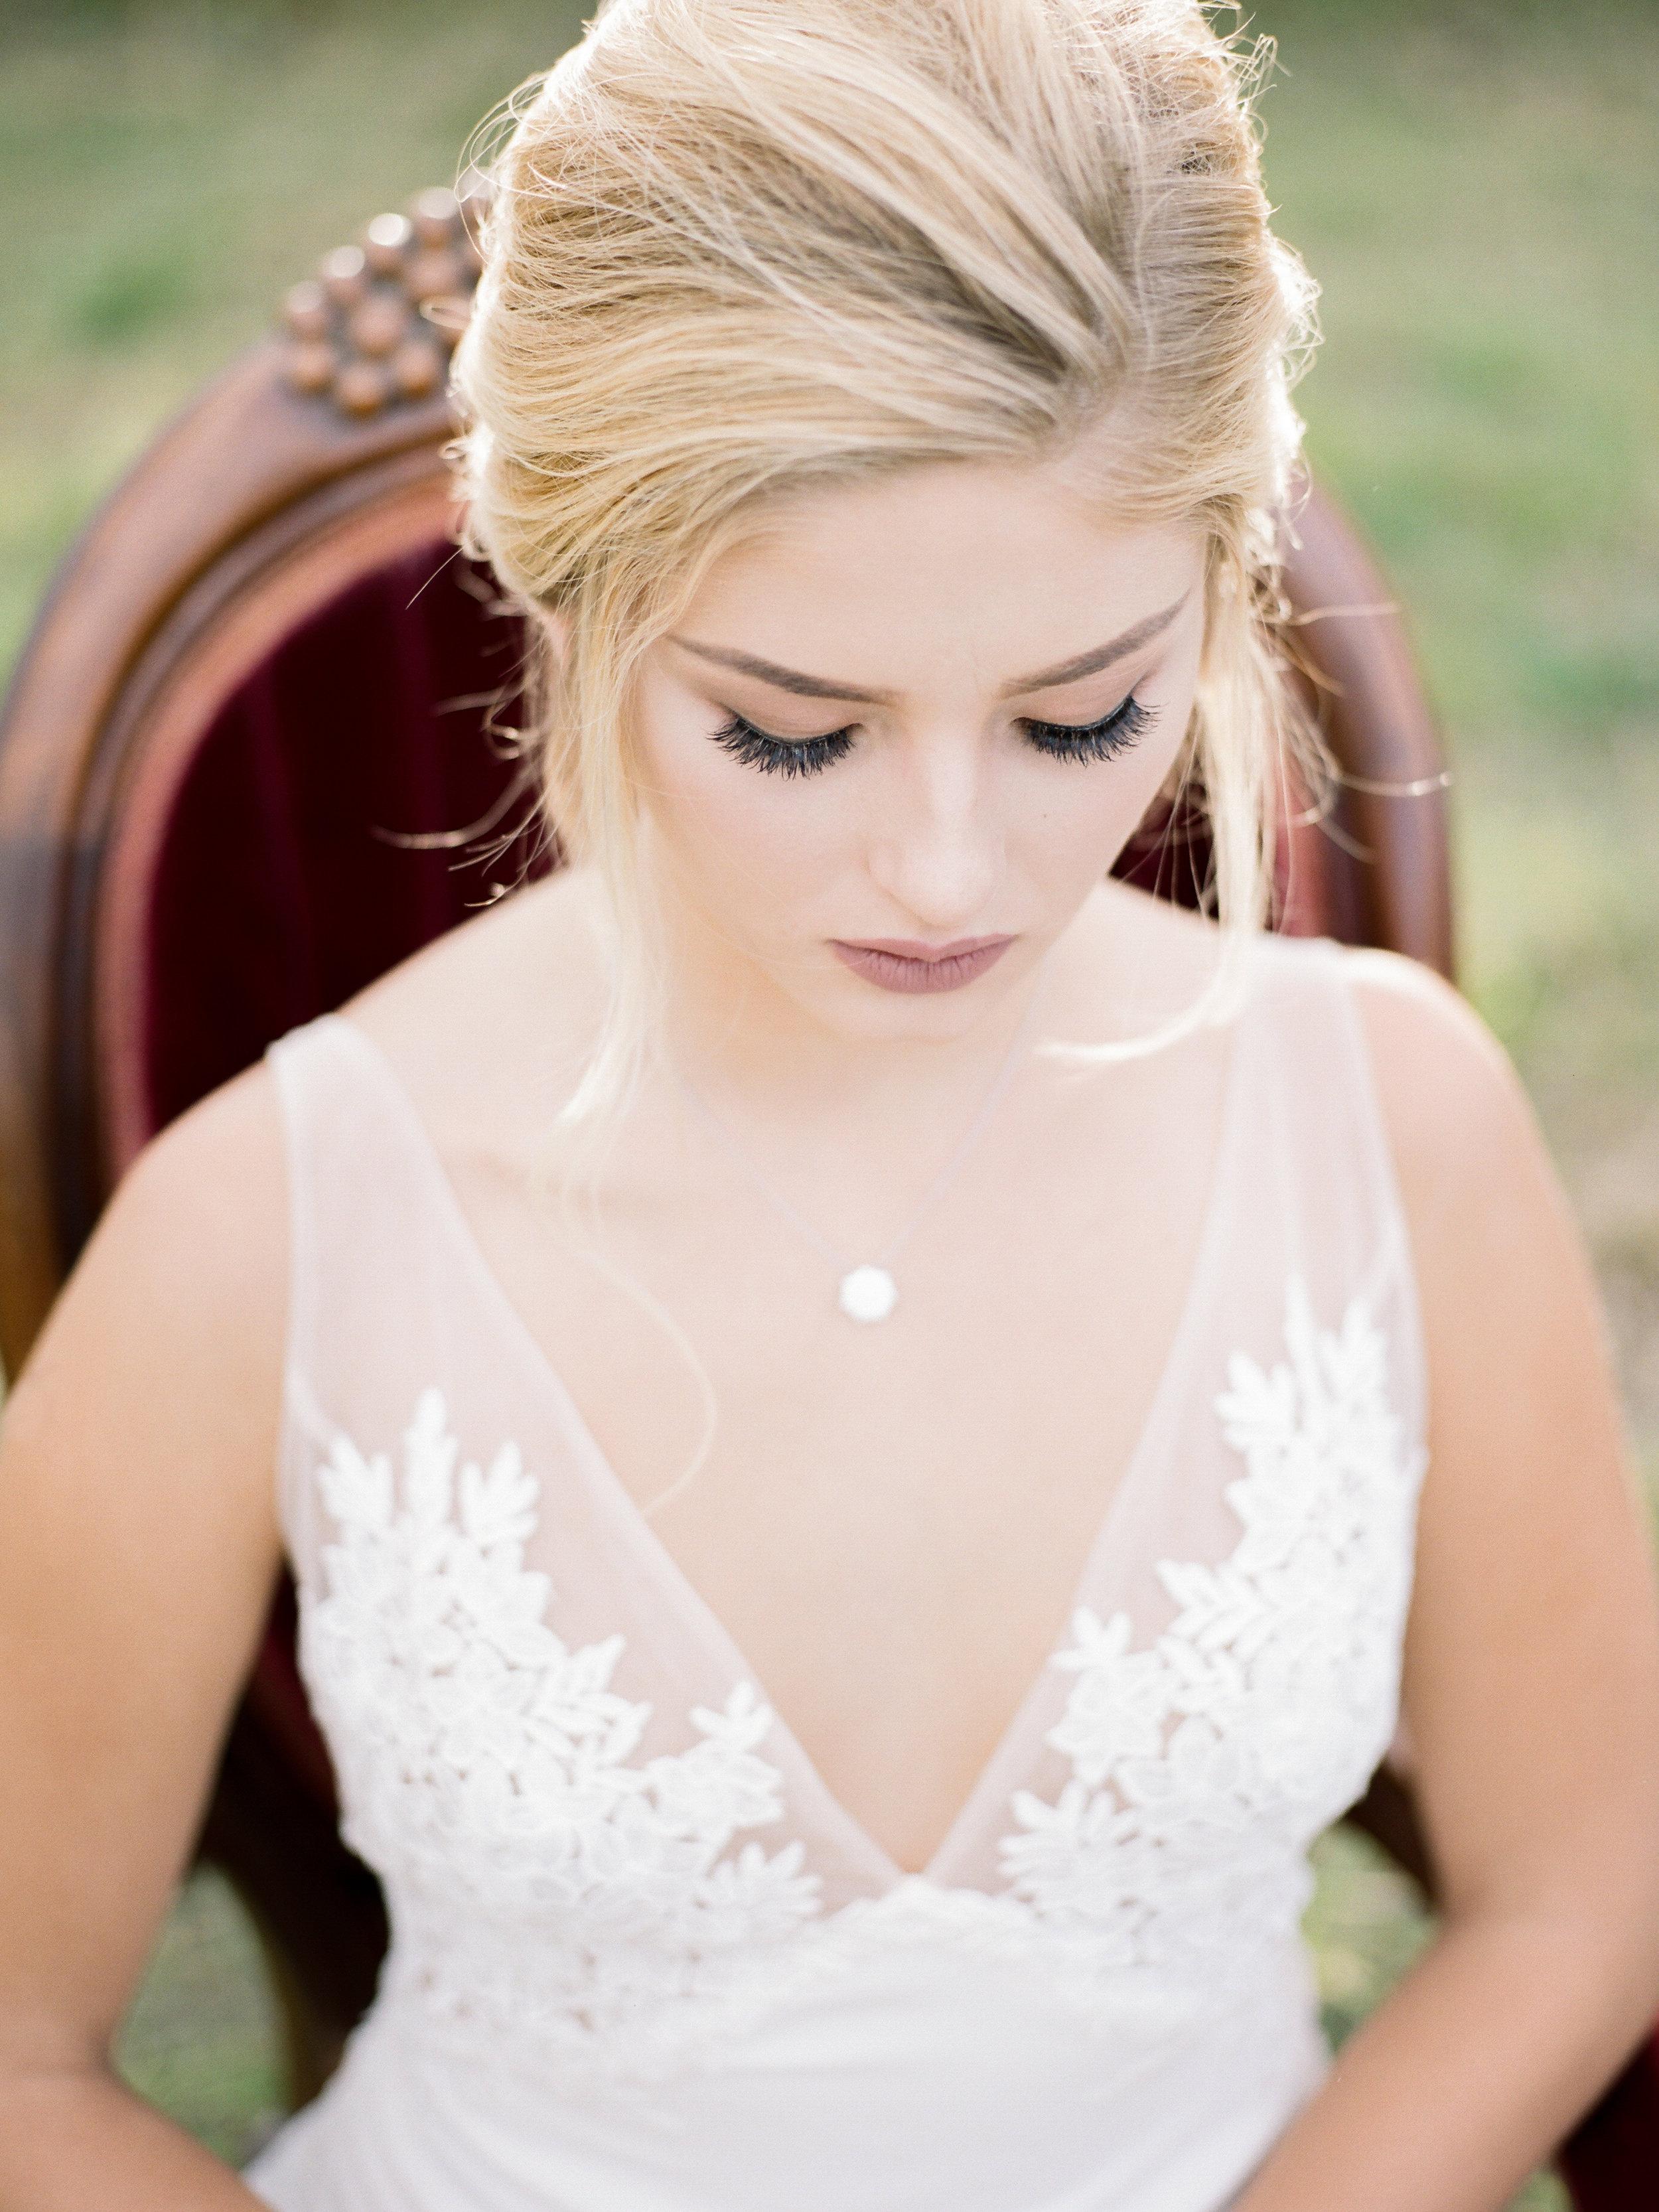 Bozeman-Big Sky-Montana-wedding-engagement-family-photographer-0157.jpg